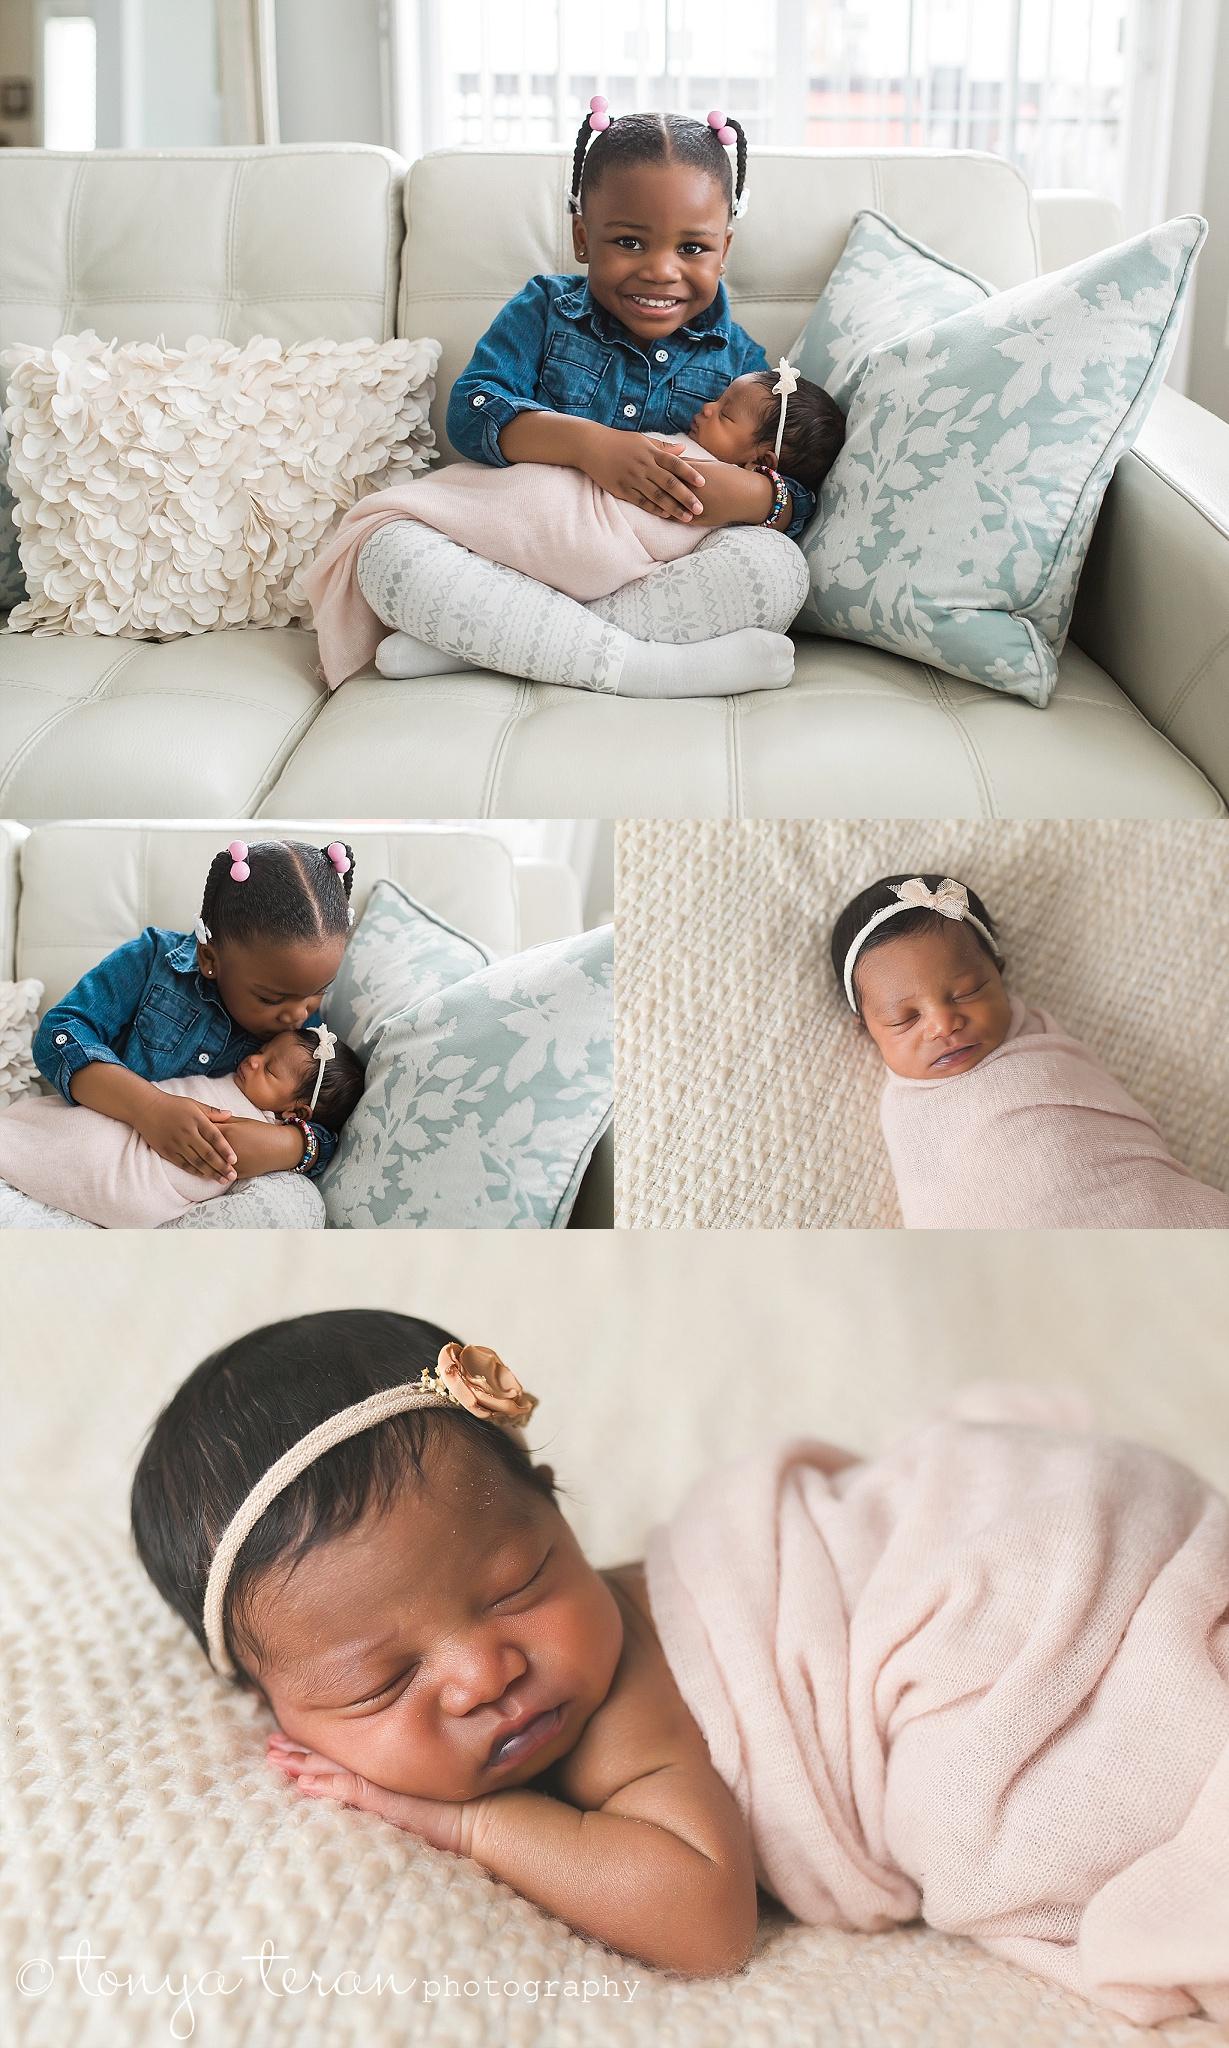 Newborn Photo Session | Tonya Teran Photography, Kensington, MD Newborn, Baby, and Family Photographer